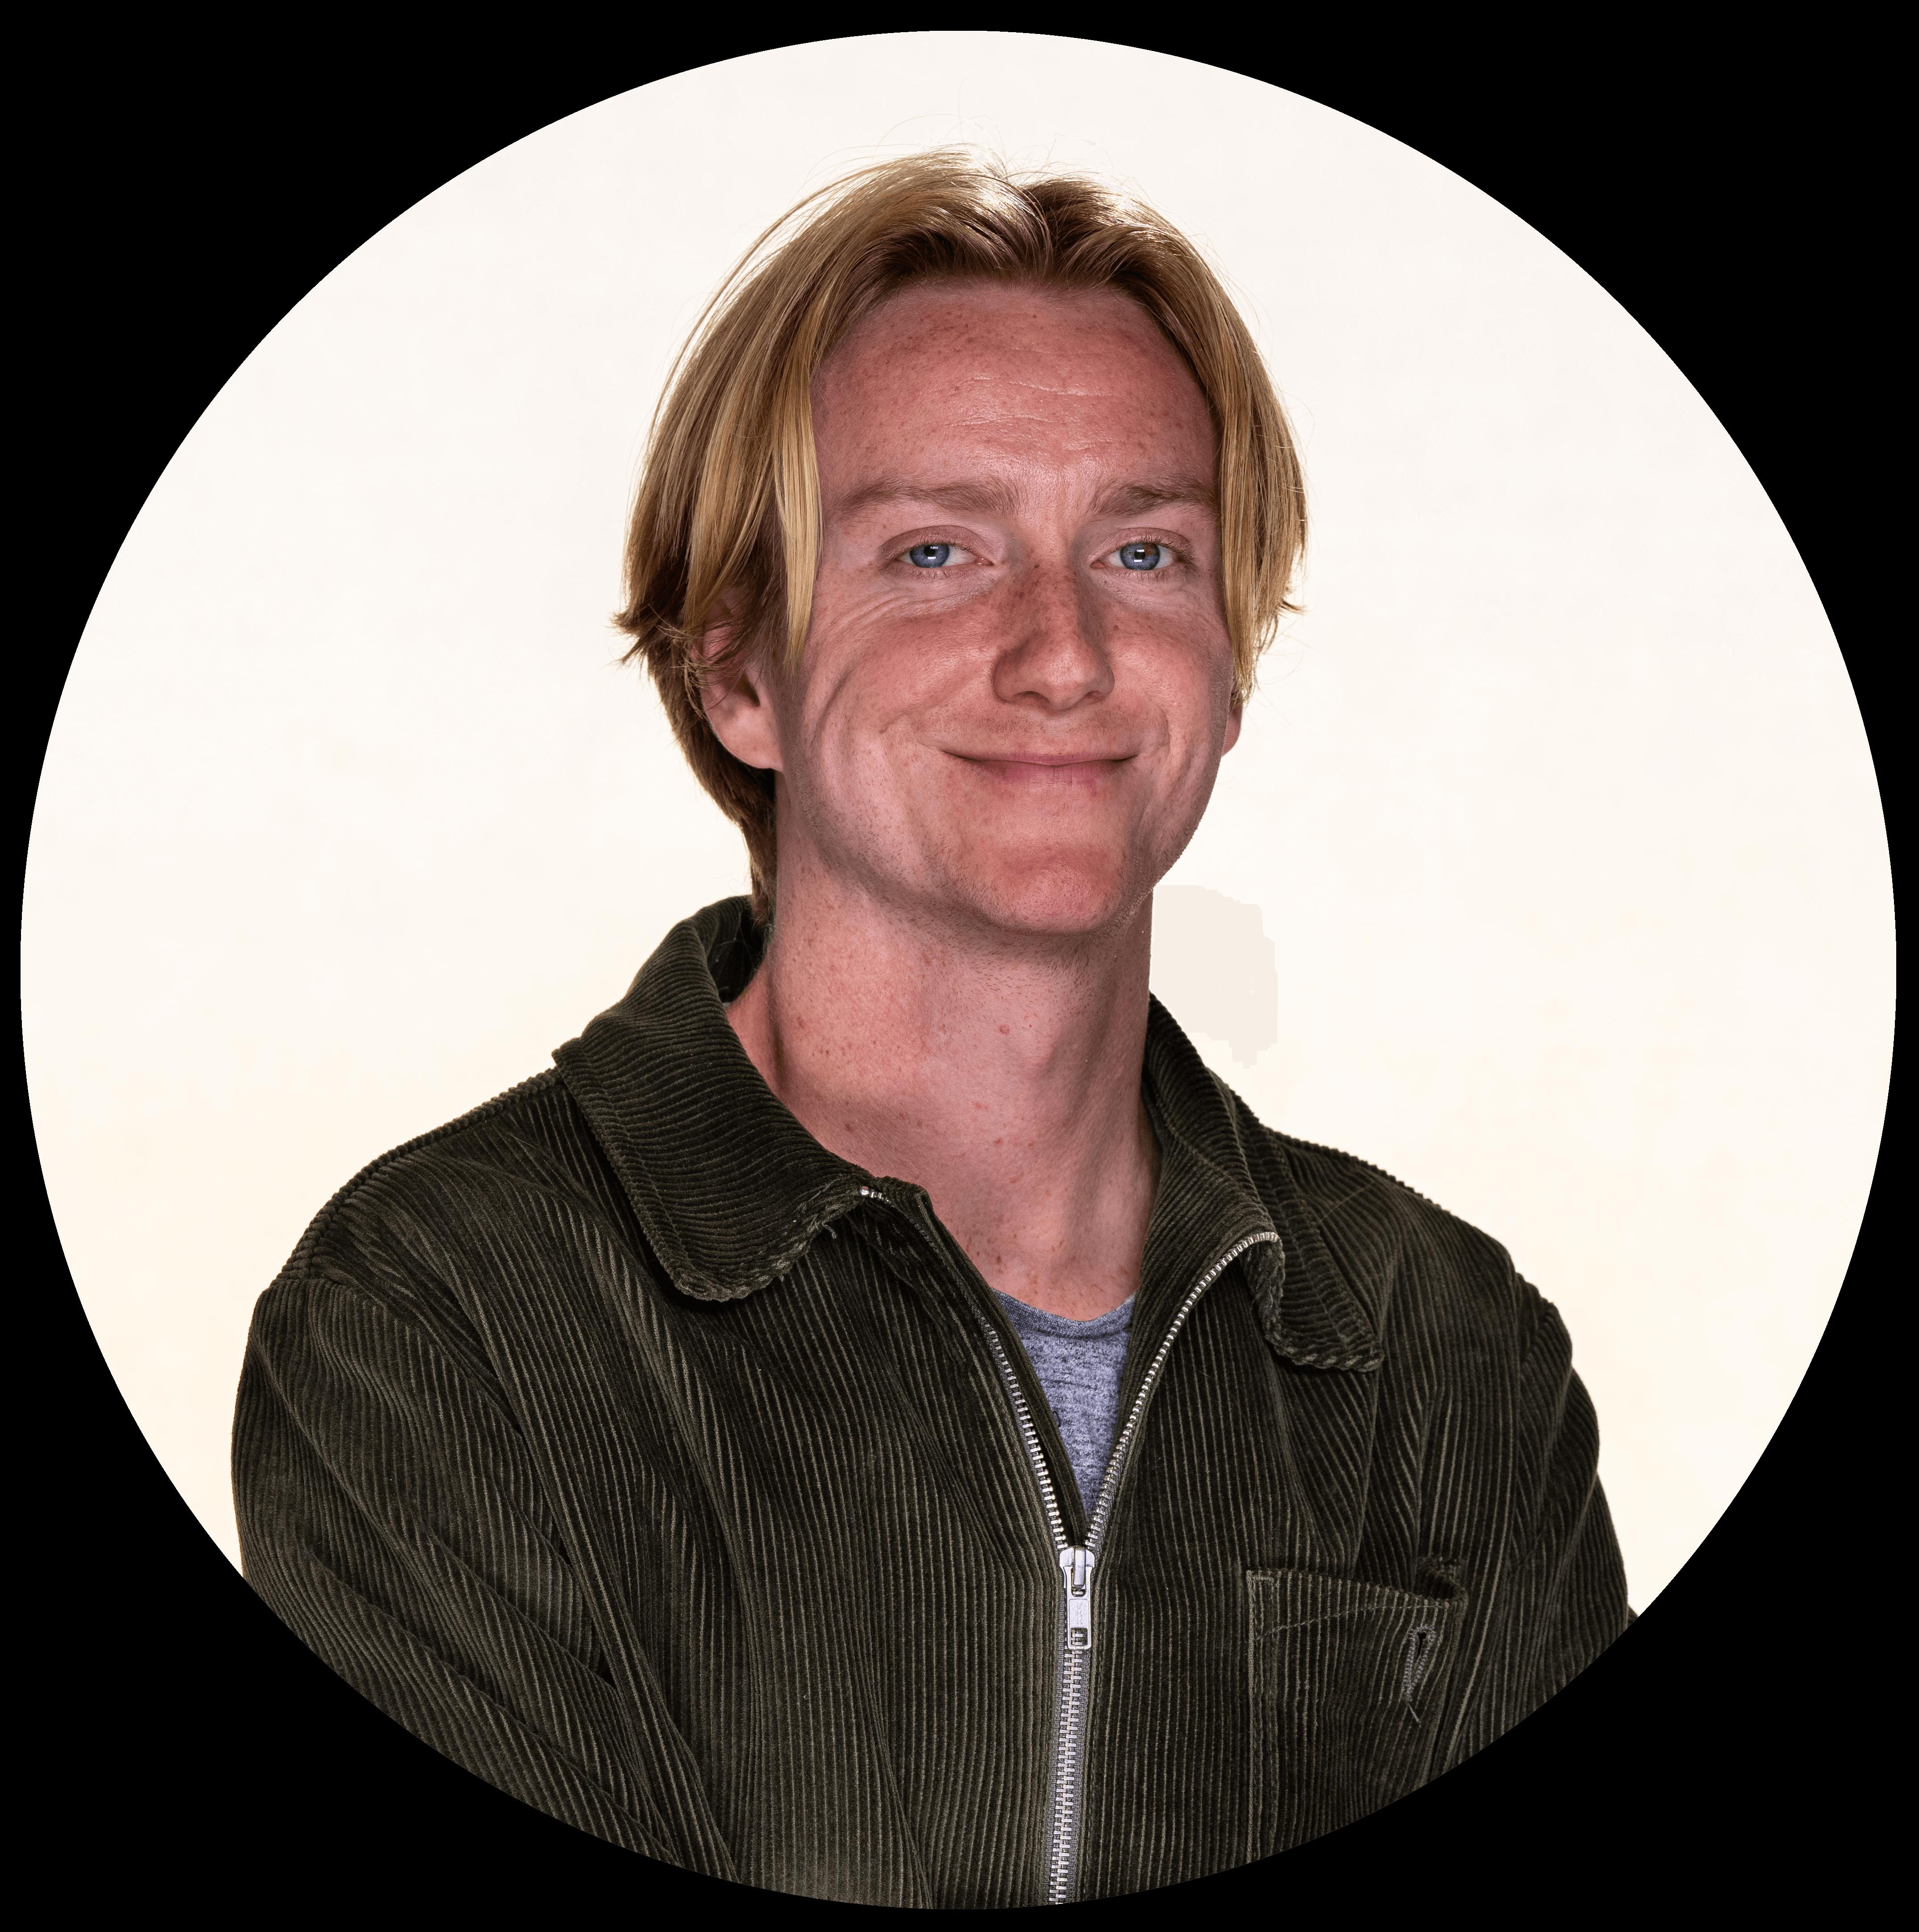 Ludwig Svensson, Social Zense